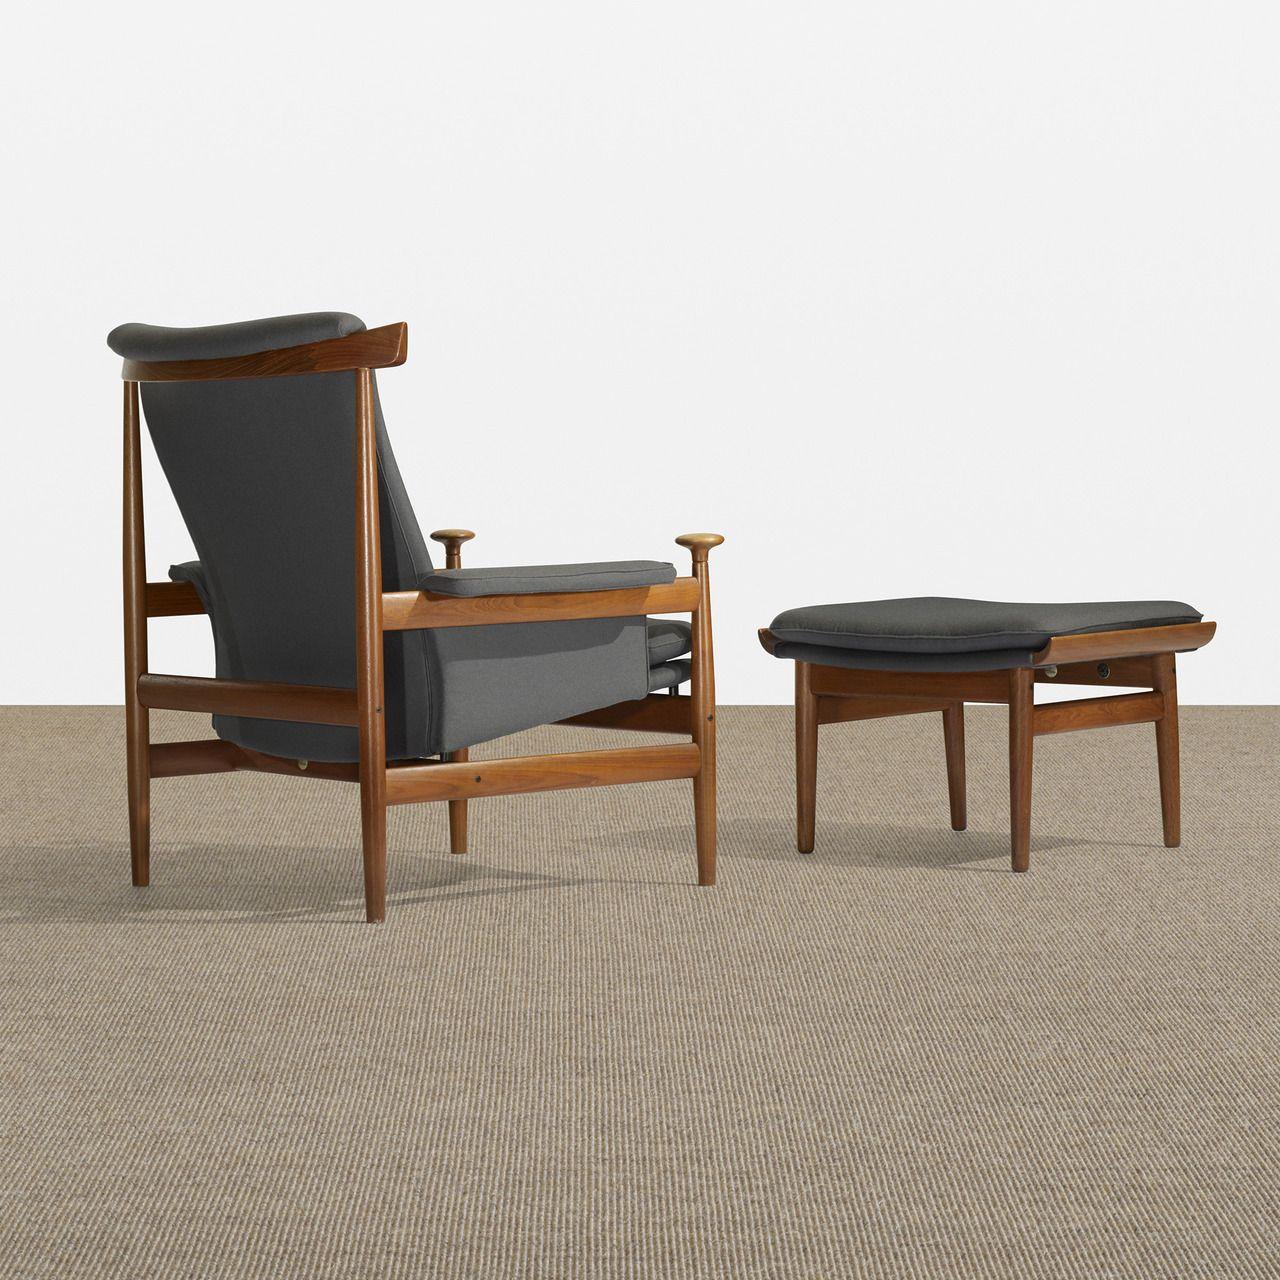 scandinaviancollectors finn juhl bwana chair with ottoman 1962